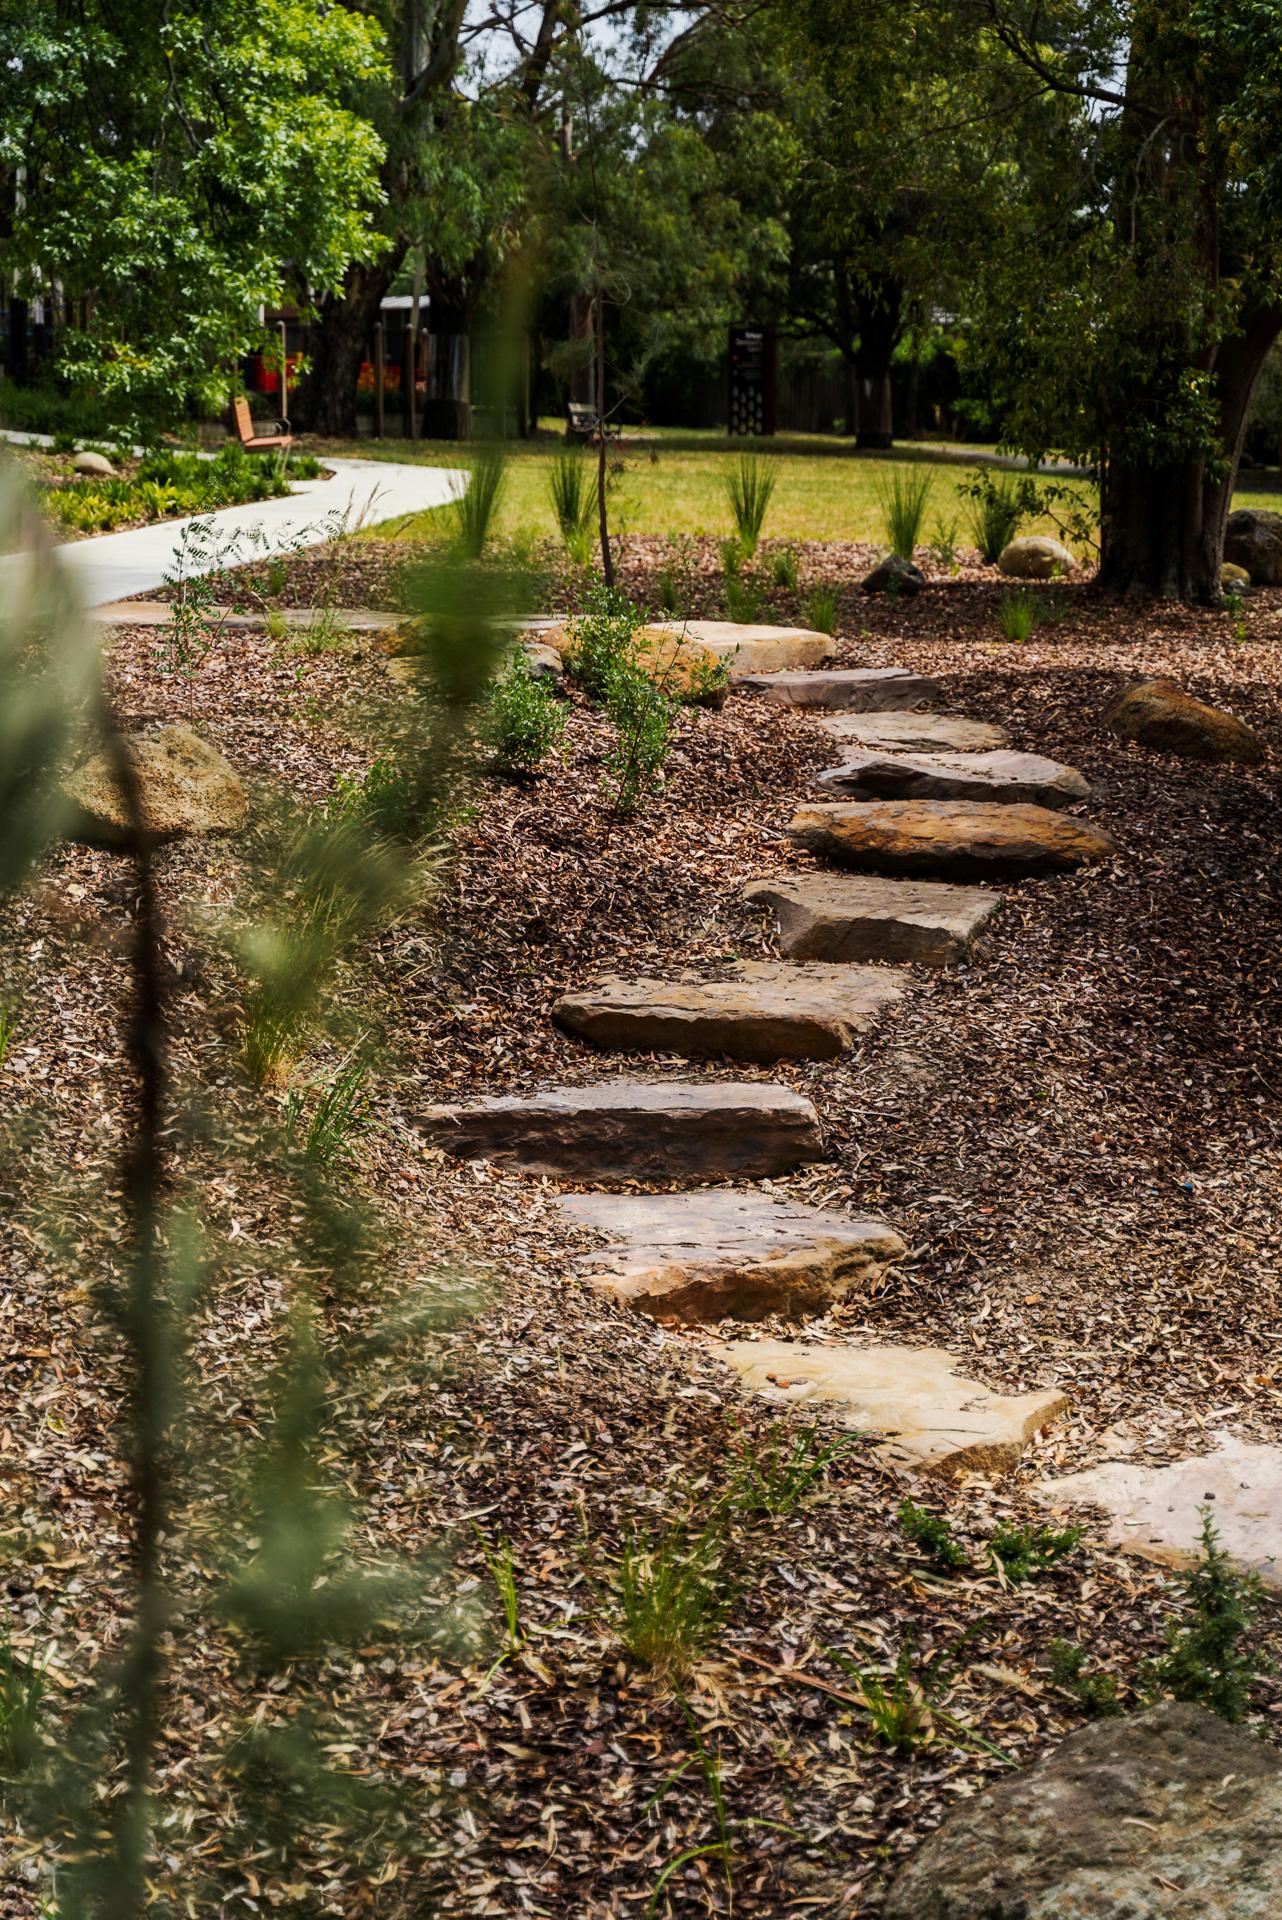 Mudstone Path